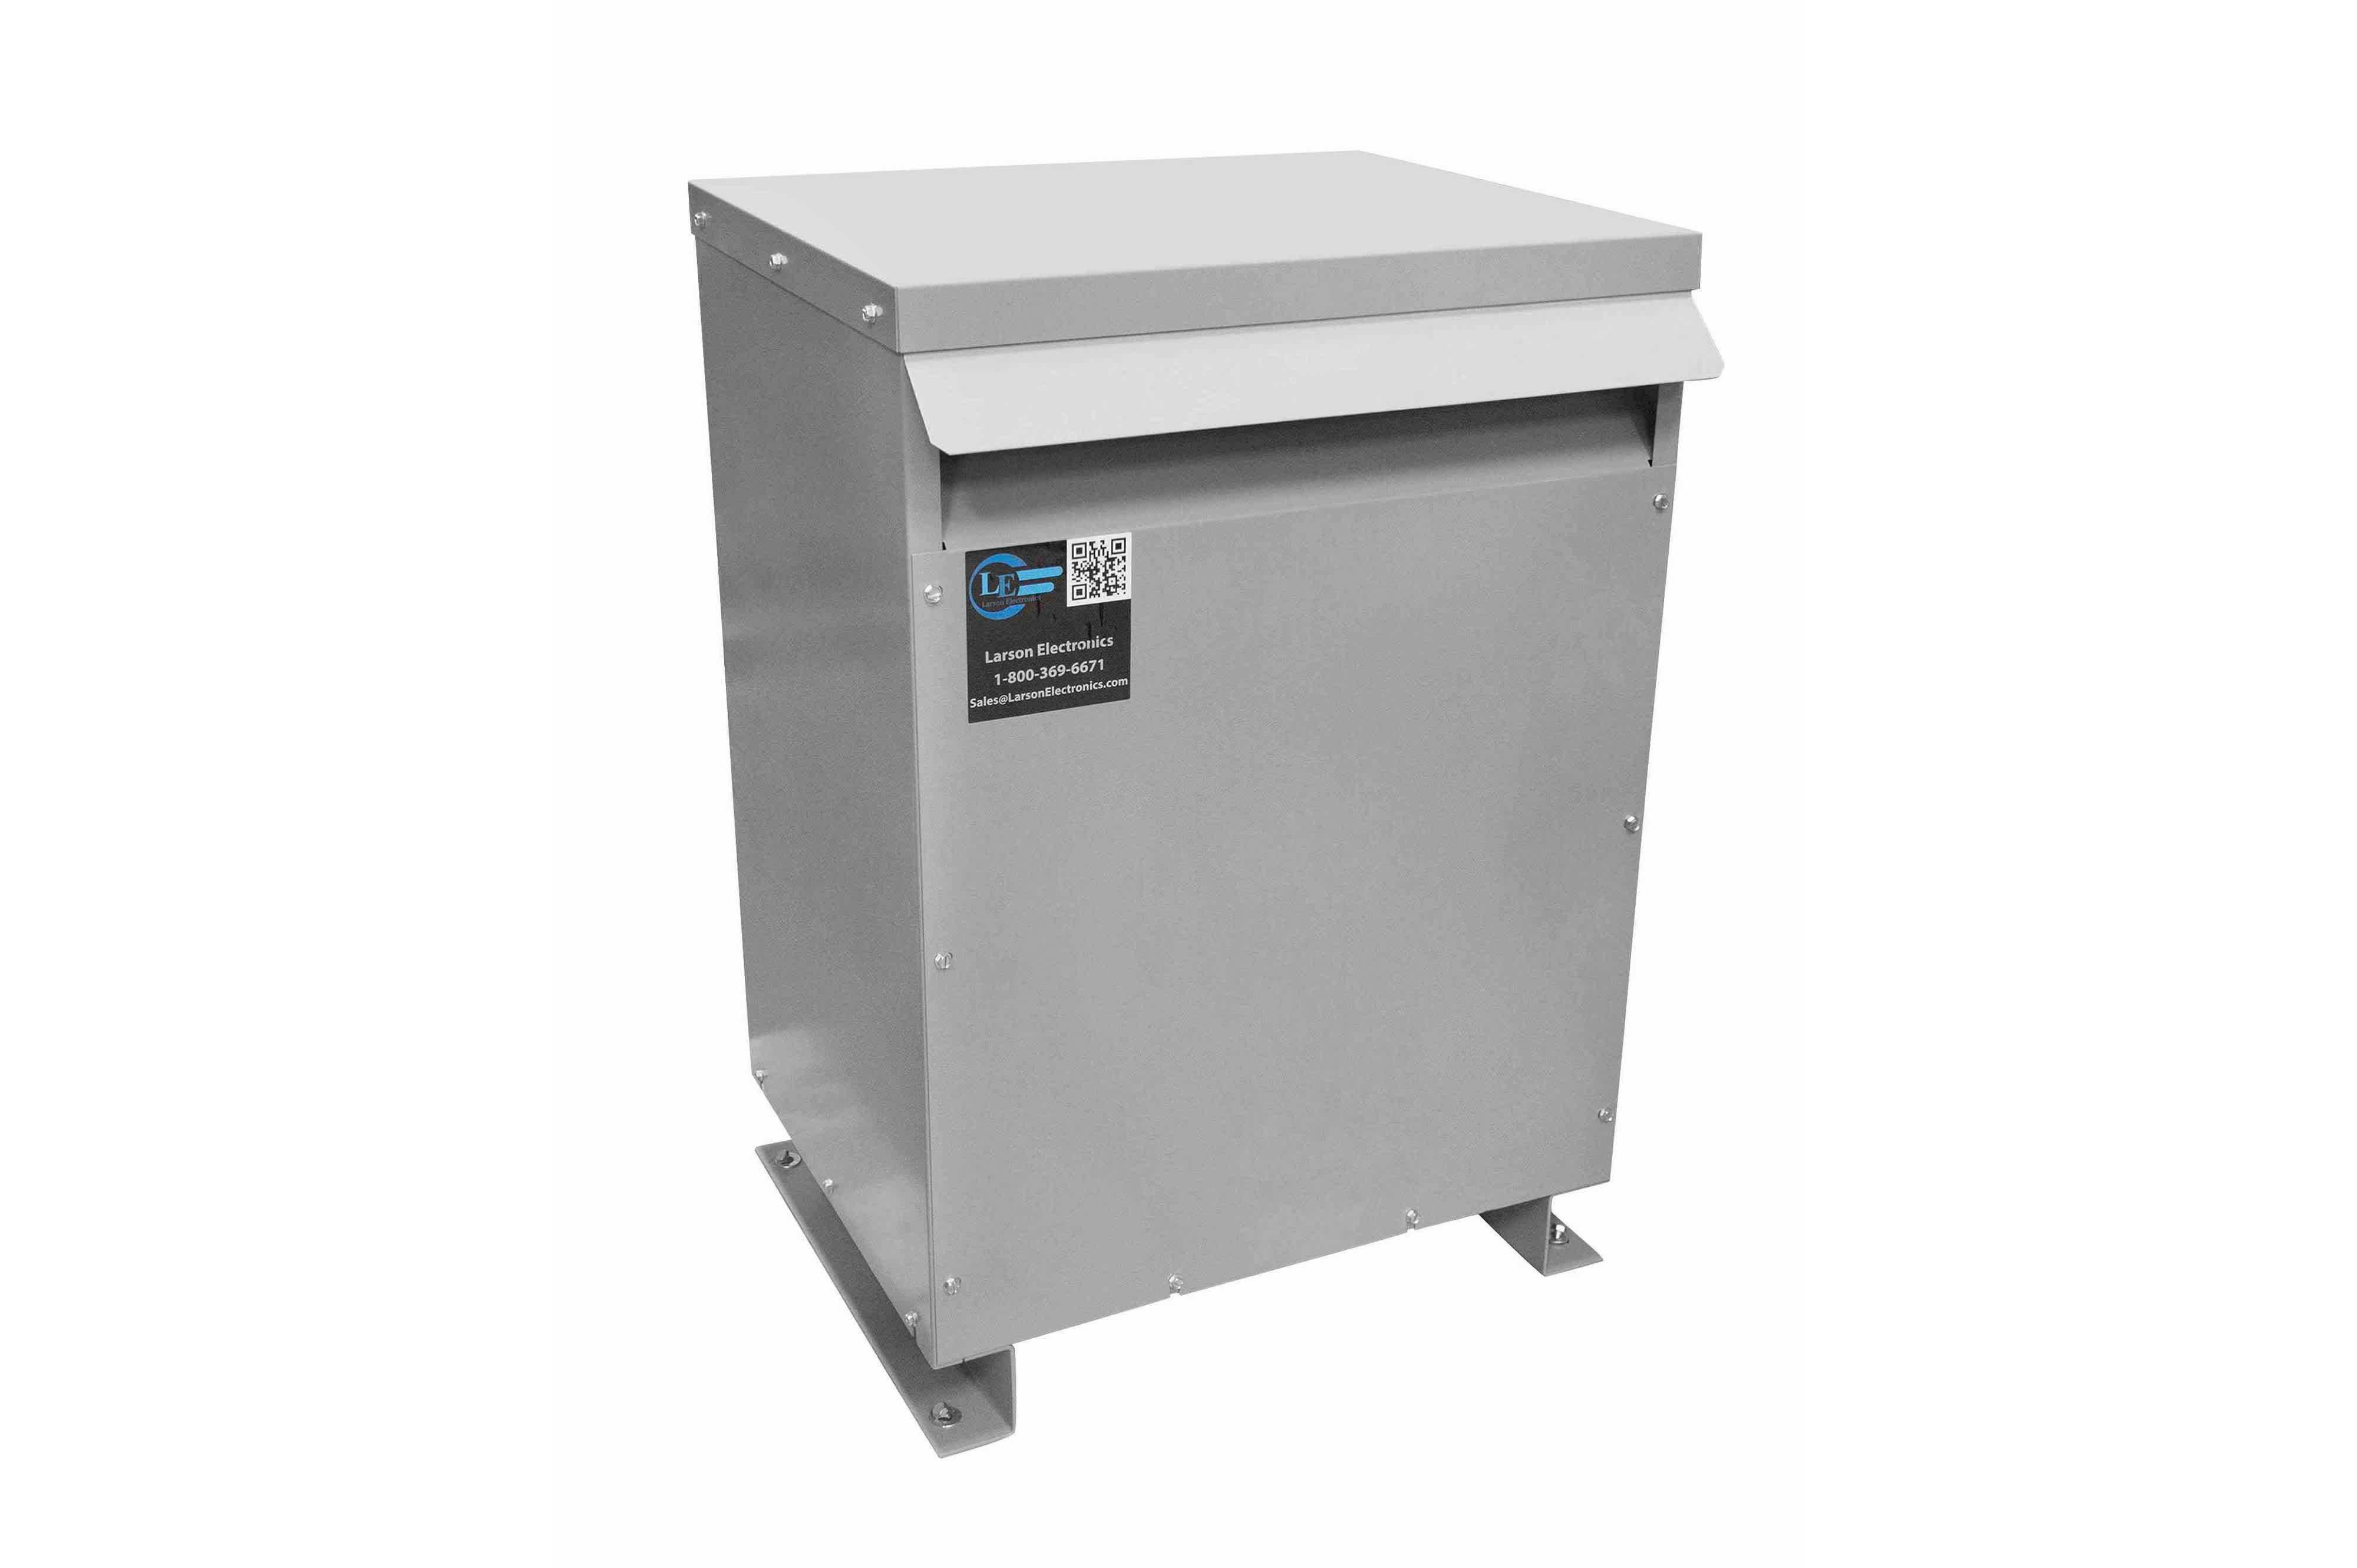 175 kVA 3PH Isolation Transformer, 415V Wye Primary, 208Y/120 Wye-N Secondary, N3R, Ventilated, 60 Hz